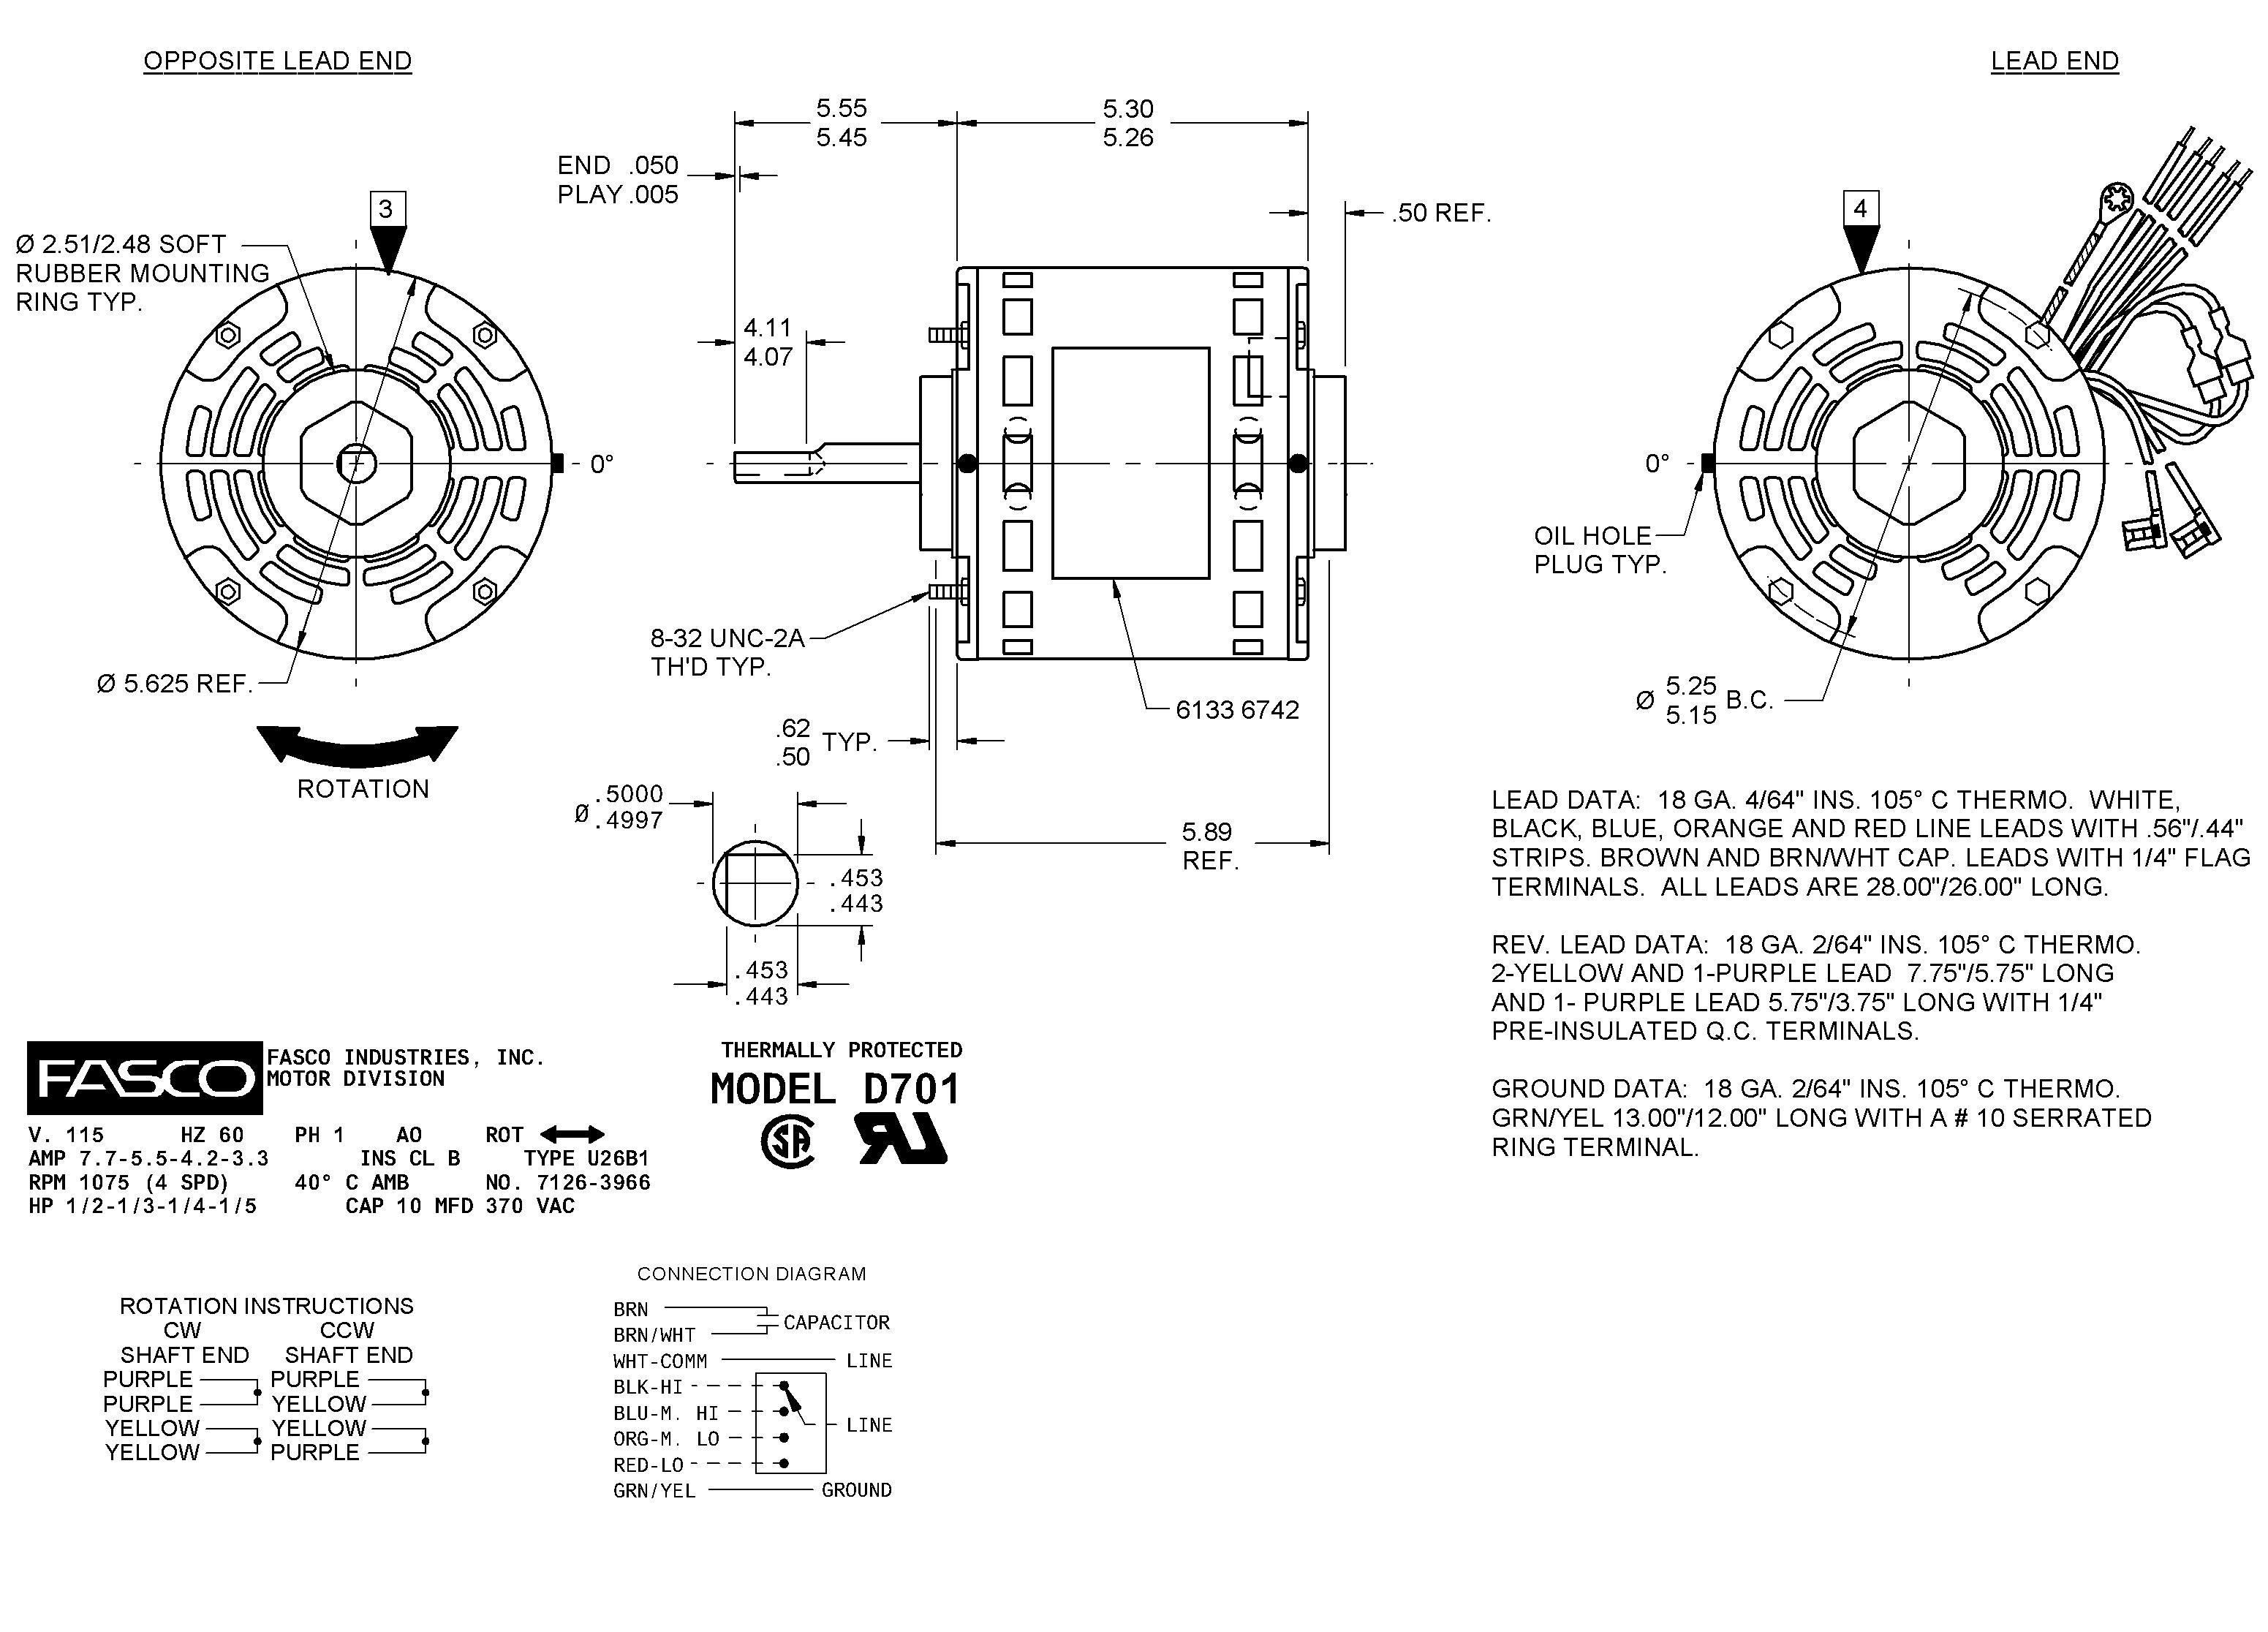 Smith Jones 3Hp Motor Wiring Diagram | Wiring Diagram - Smith And Jones Electric Motors Wiring Diagram